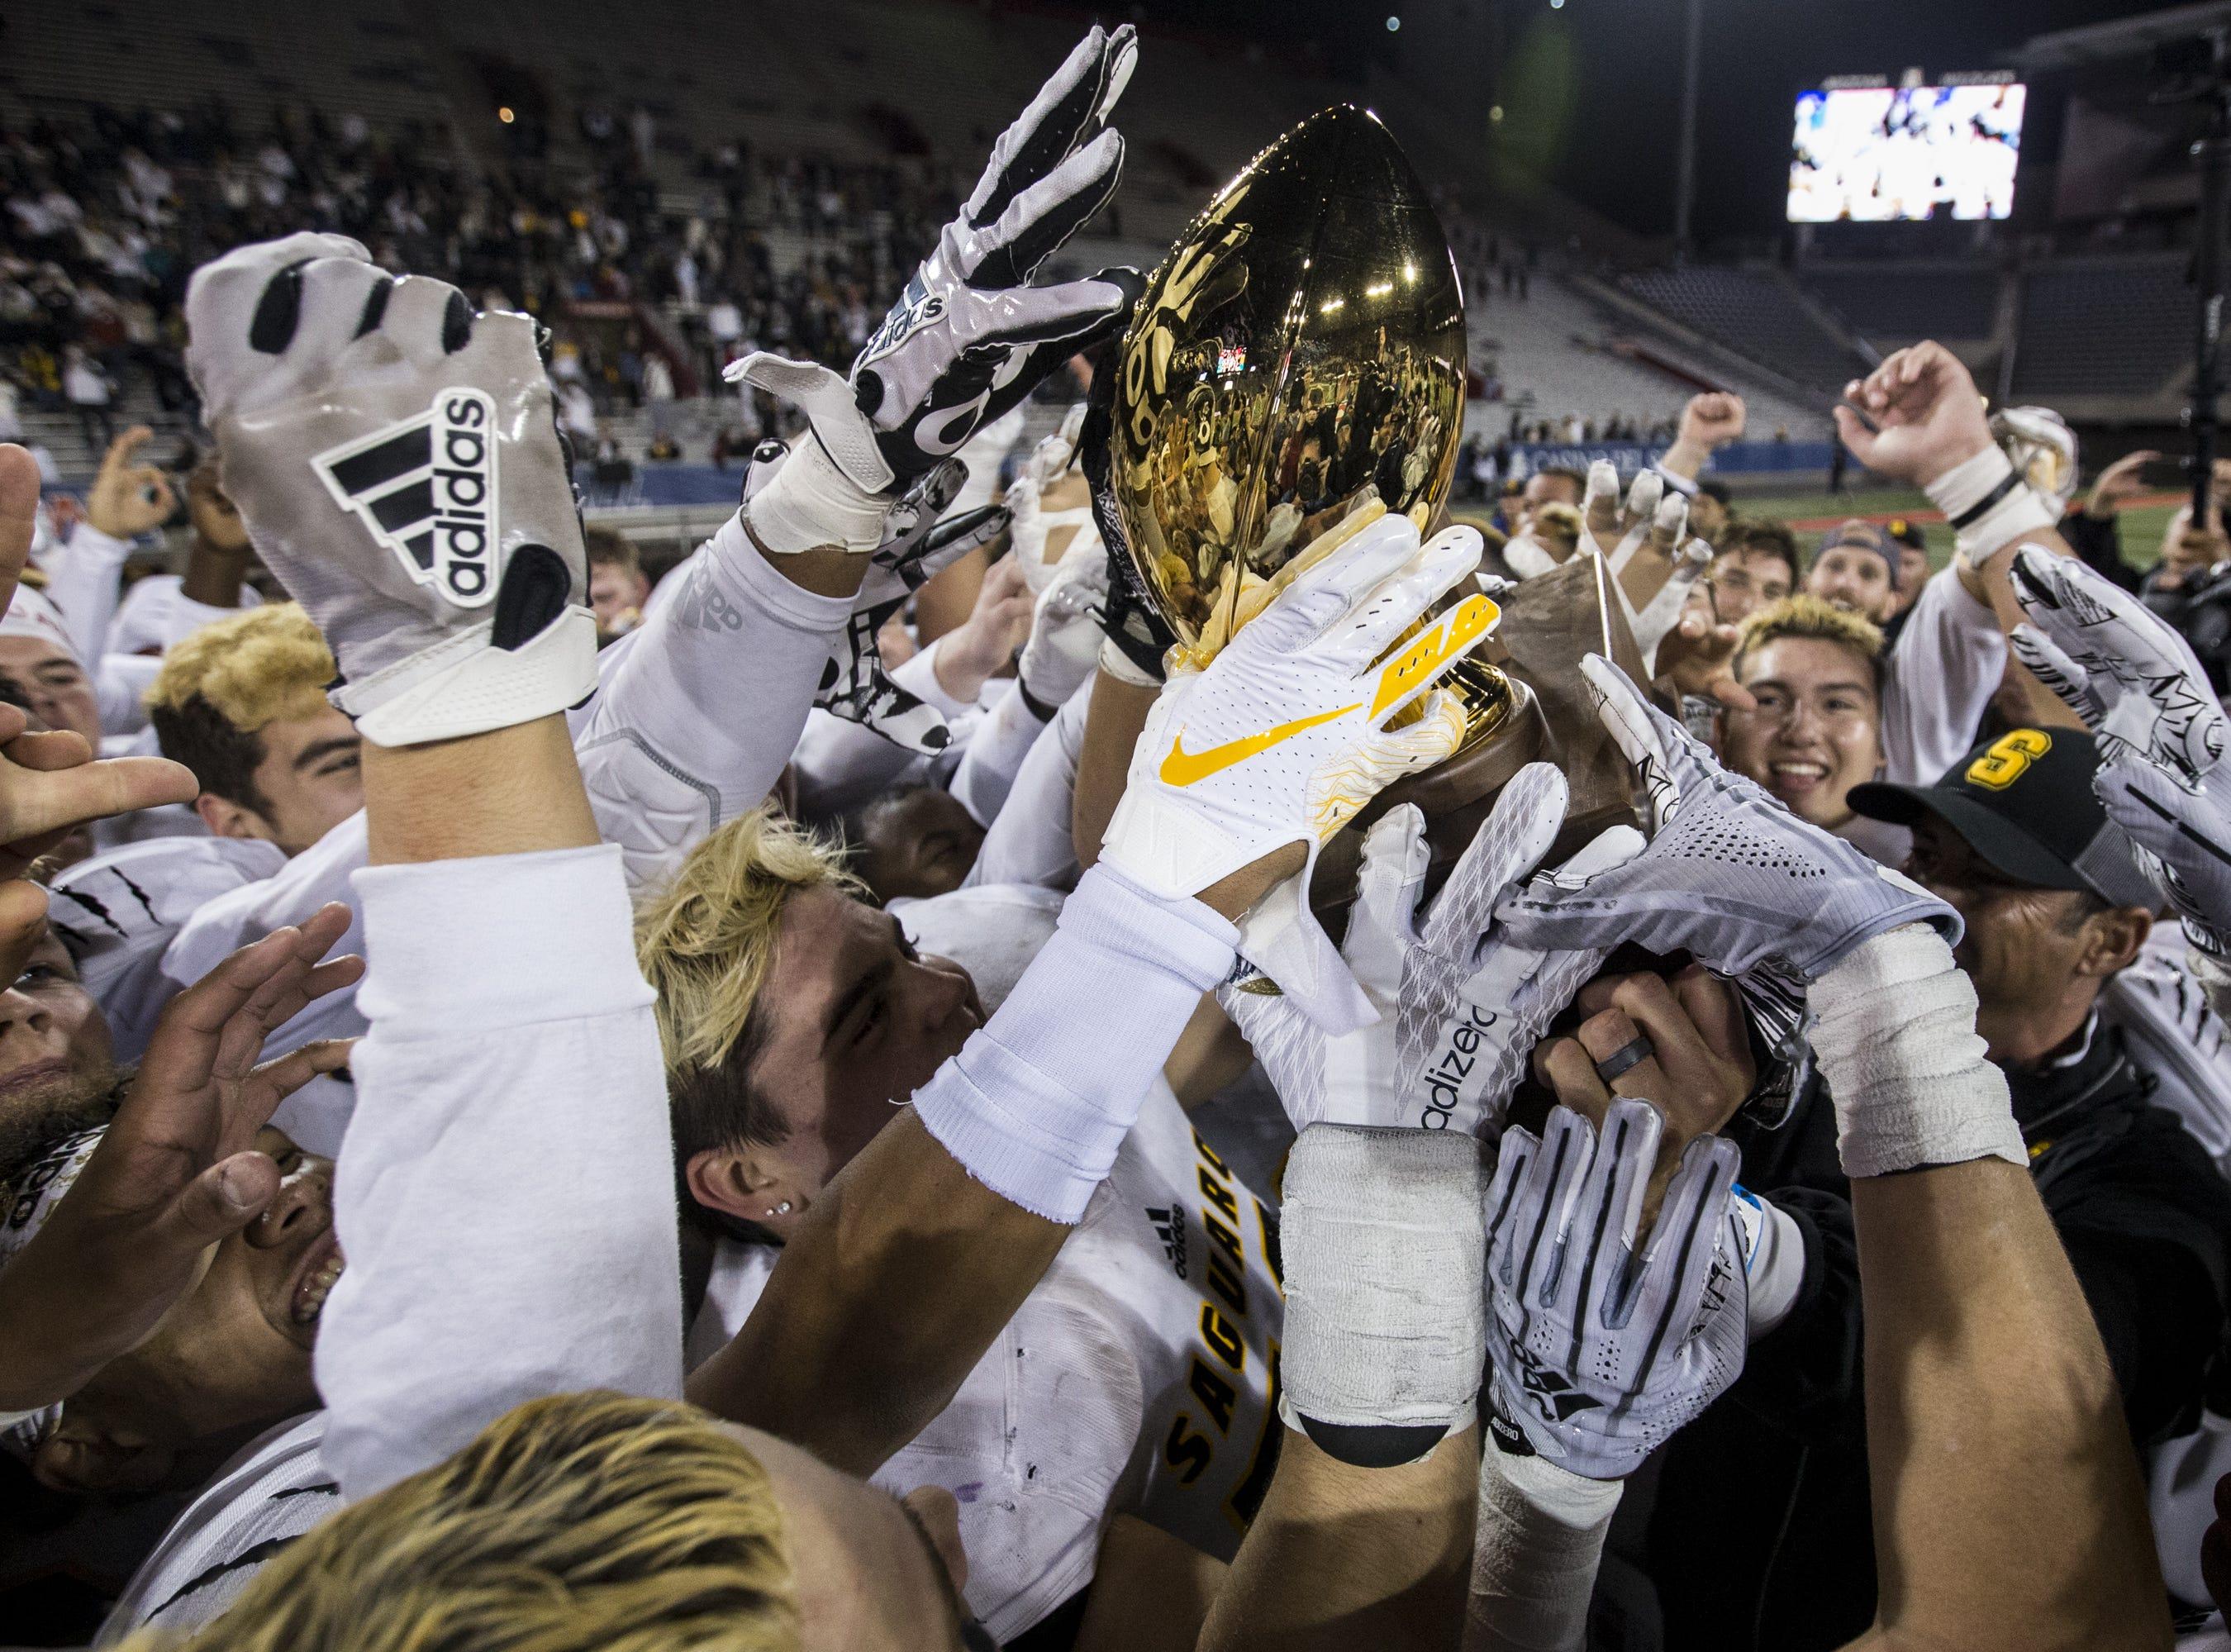 Arizona's best high school football programs: Making their mark